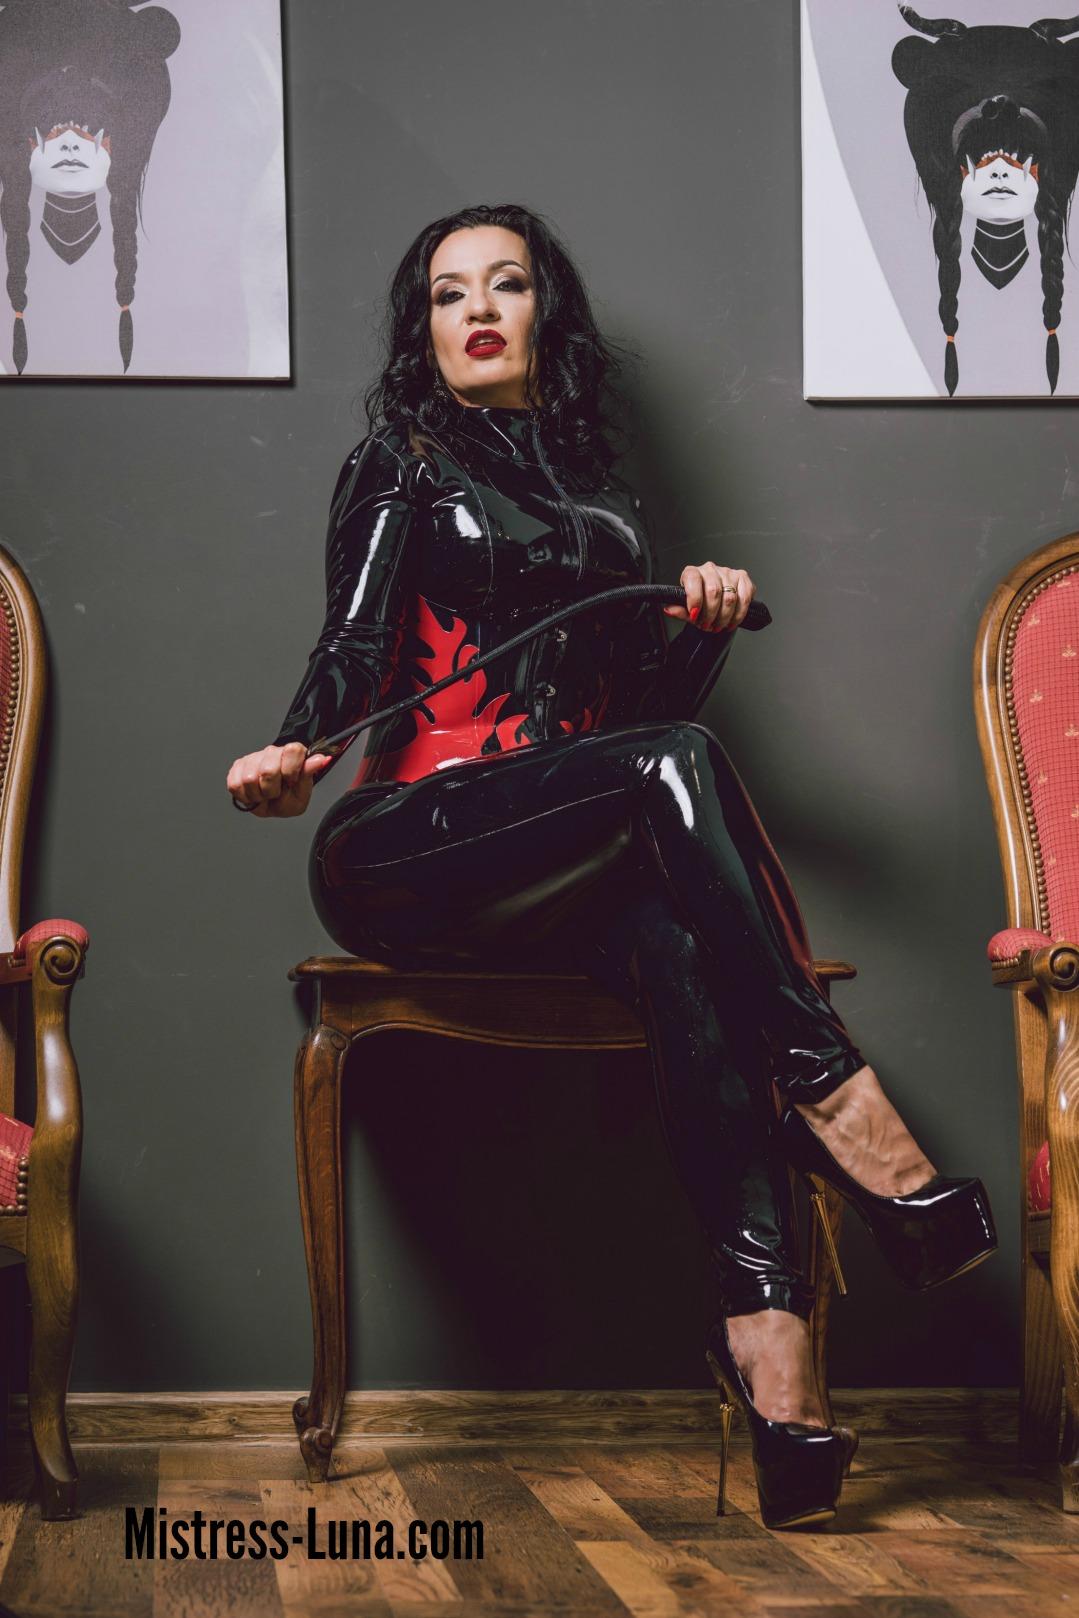 2017-10-MistressLuna